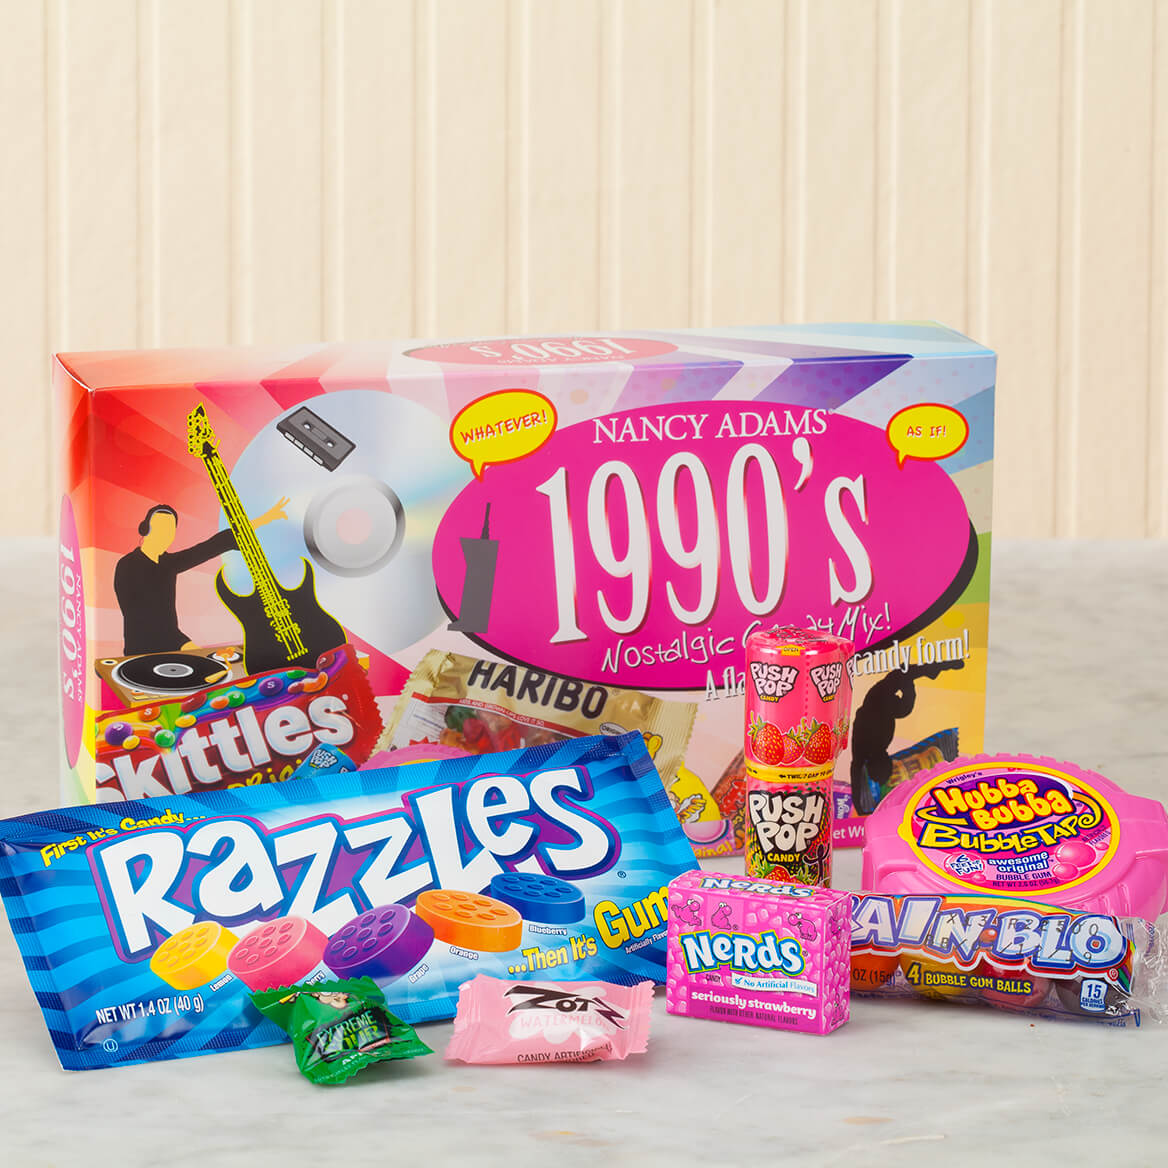 Nostalgic Candy - Miles Kimball